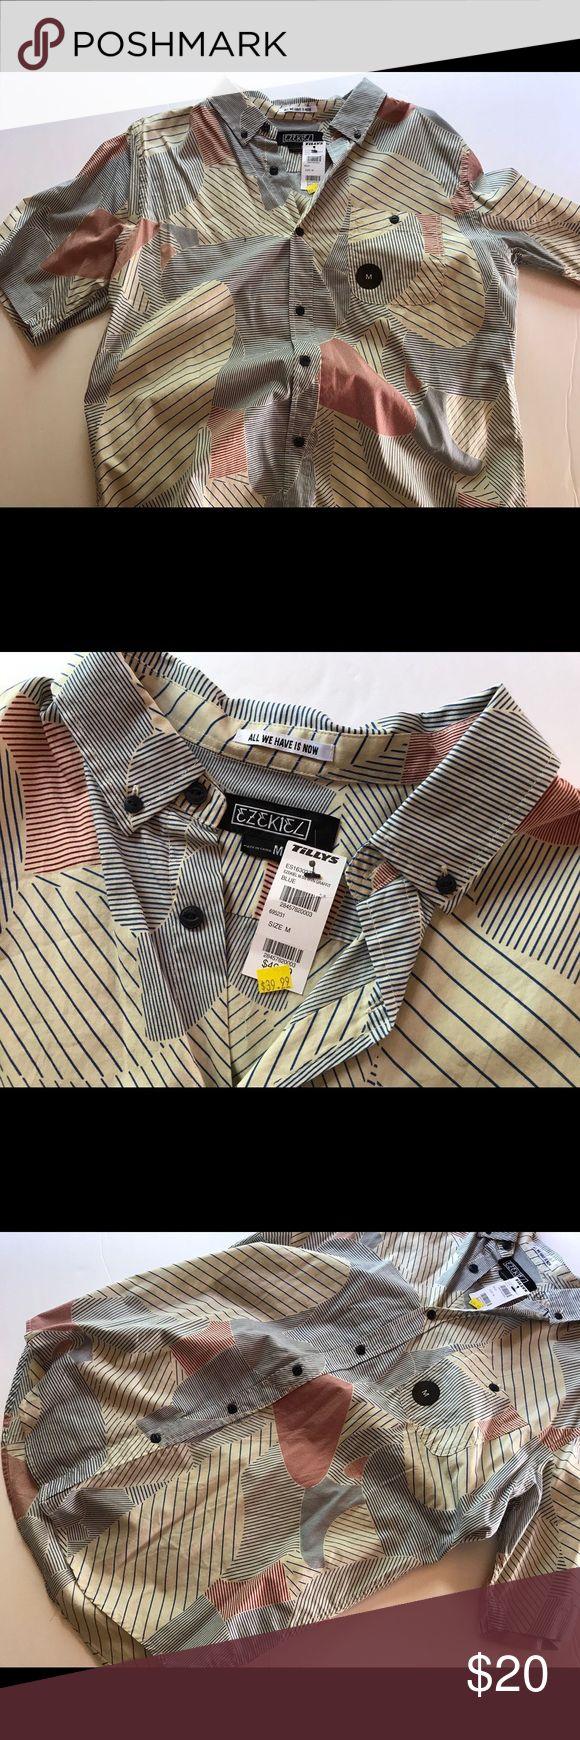 ✨✨beautiful men's shirt✨✨ Men's shirt brand new with tags. Shirts Tees - Short Sleeve